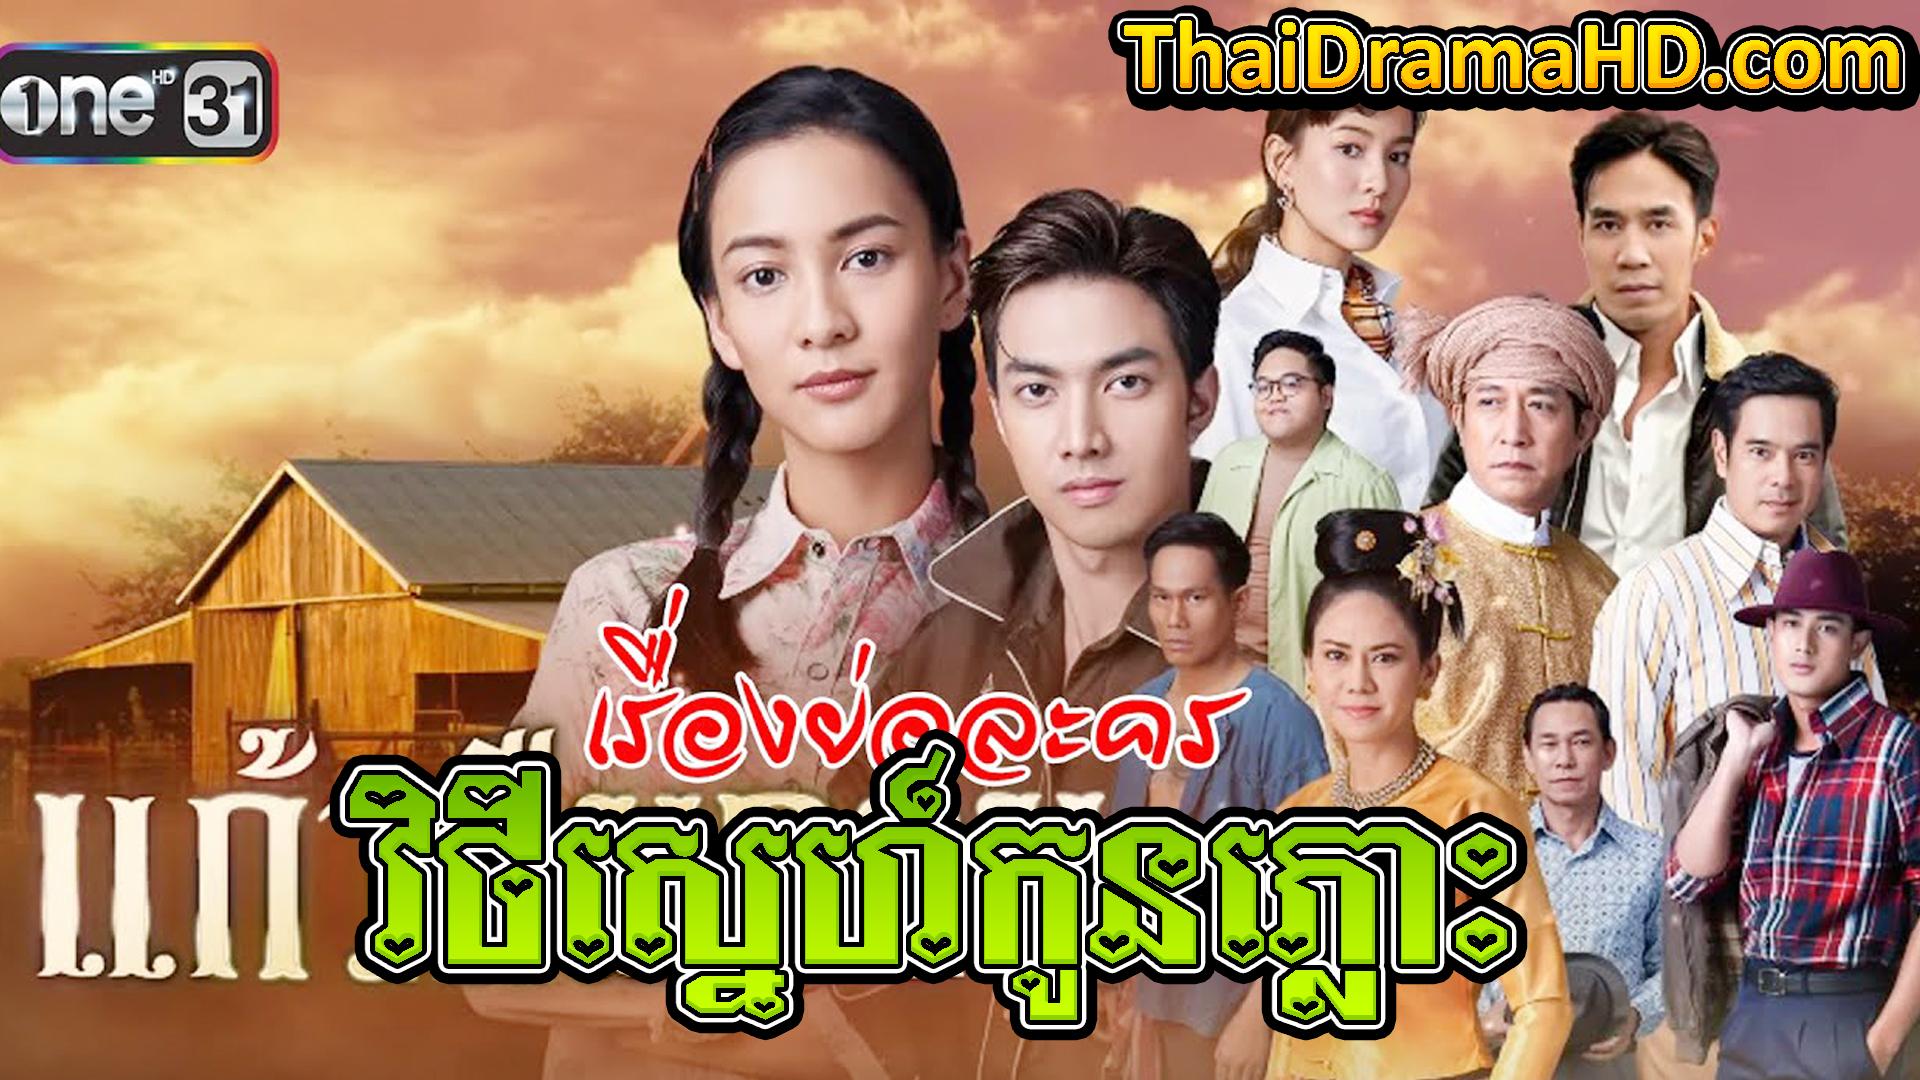 Vithey Sne Kon Phlouh | Thai Drama | Khmer Movie | Phumikhmer | movie-khmer | video4khmer | khmotions | kolabkhmer | khmer drama | ksdrama | cookingtips | roscheat | khmertimeskh | khmerkomsan | phumi7 | merlkon | film2us | movie2kh | sweetdrama | khmercitylove | khreplay | tvb cambodia drama | ckh7 | srokthai | phumimedia | phumi8 | khmer avenue | khmer search | Soyo | khmerfans